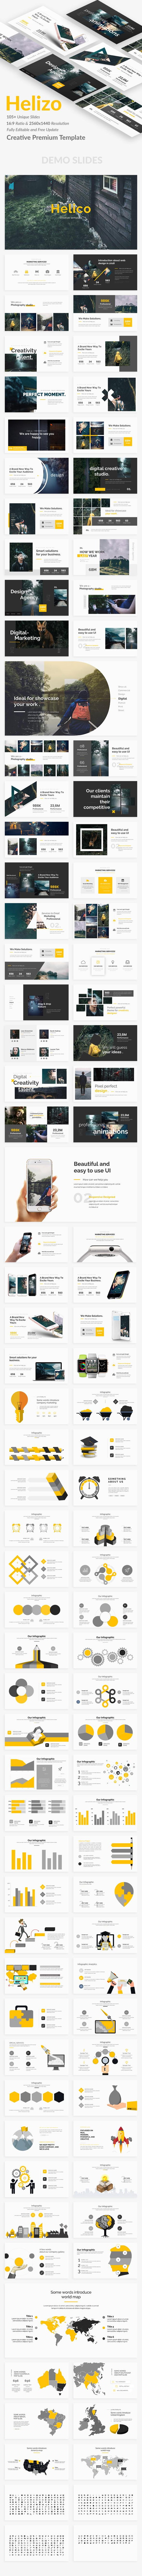 Helizo Premium Creative Design Google Slide Template - Google Slides Presentation Templates